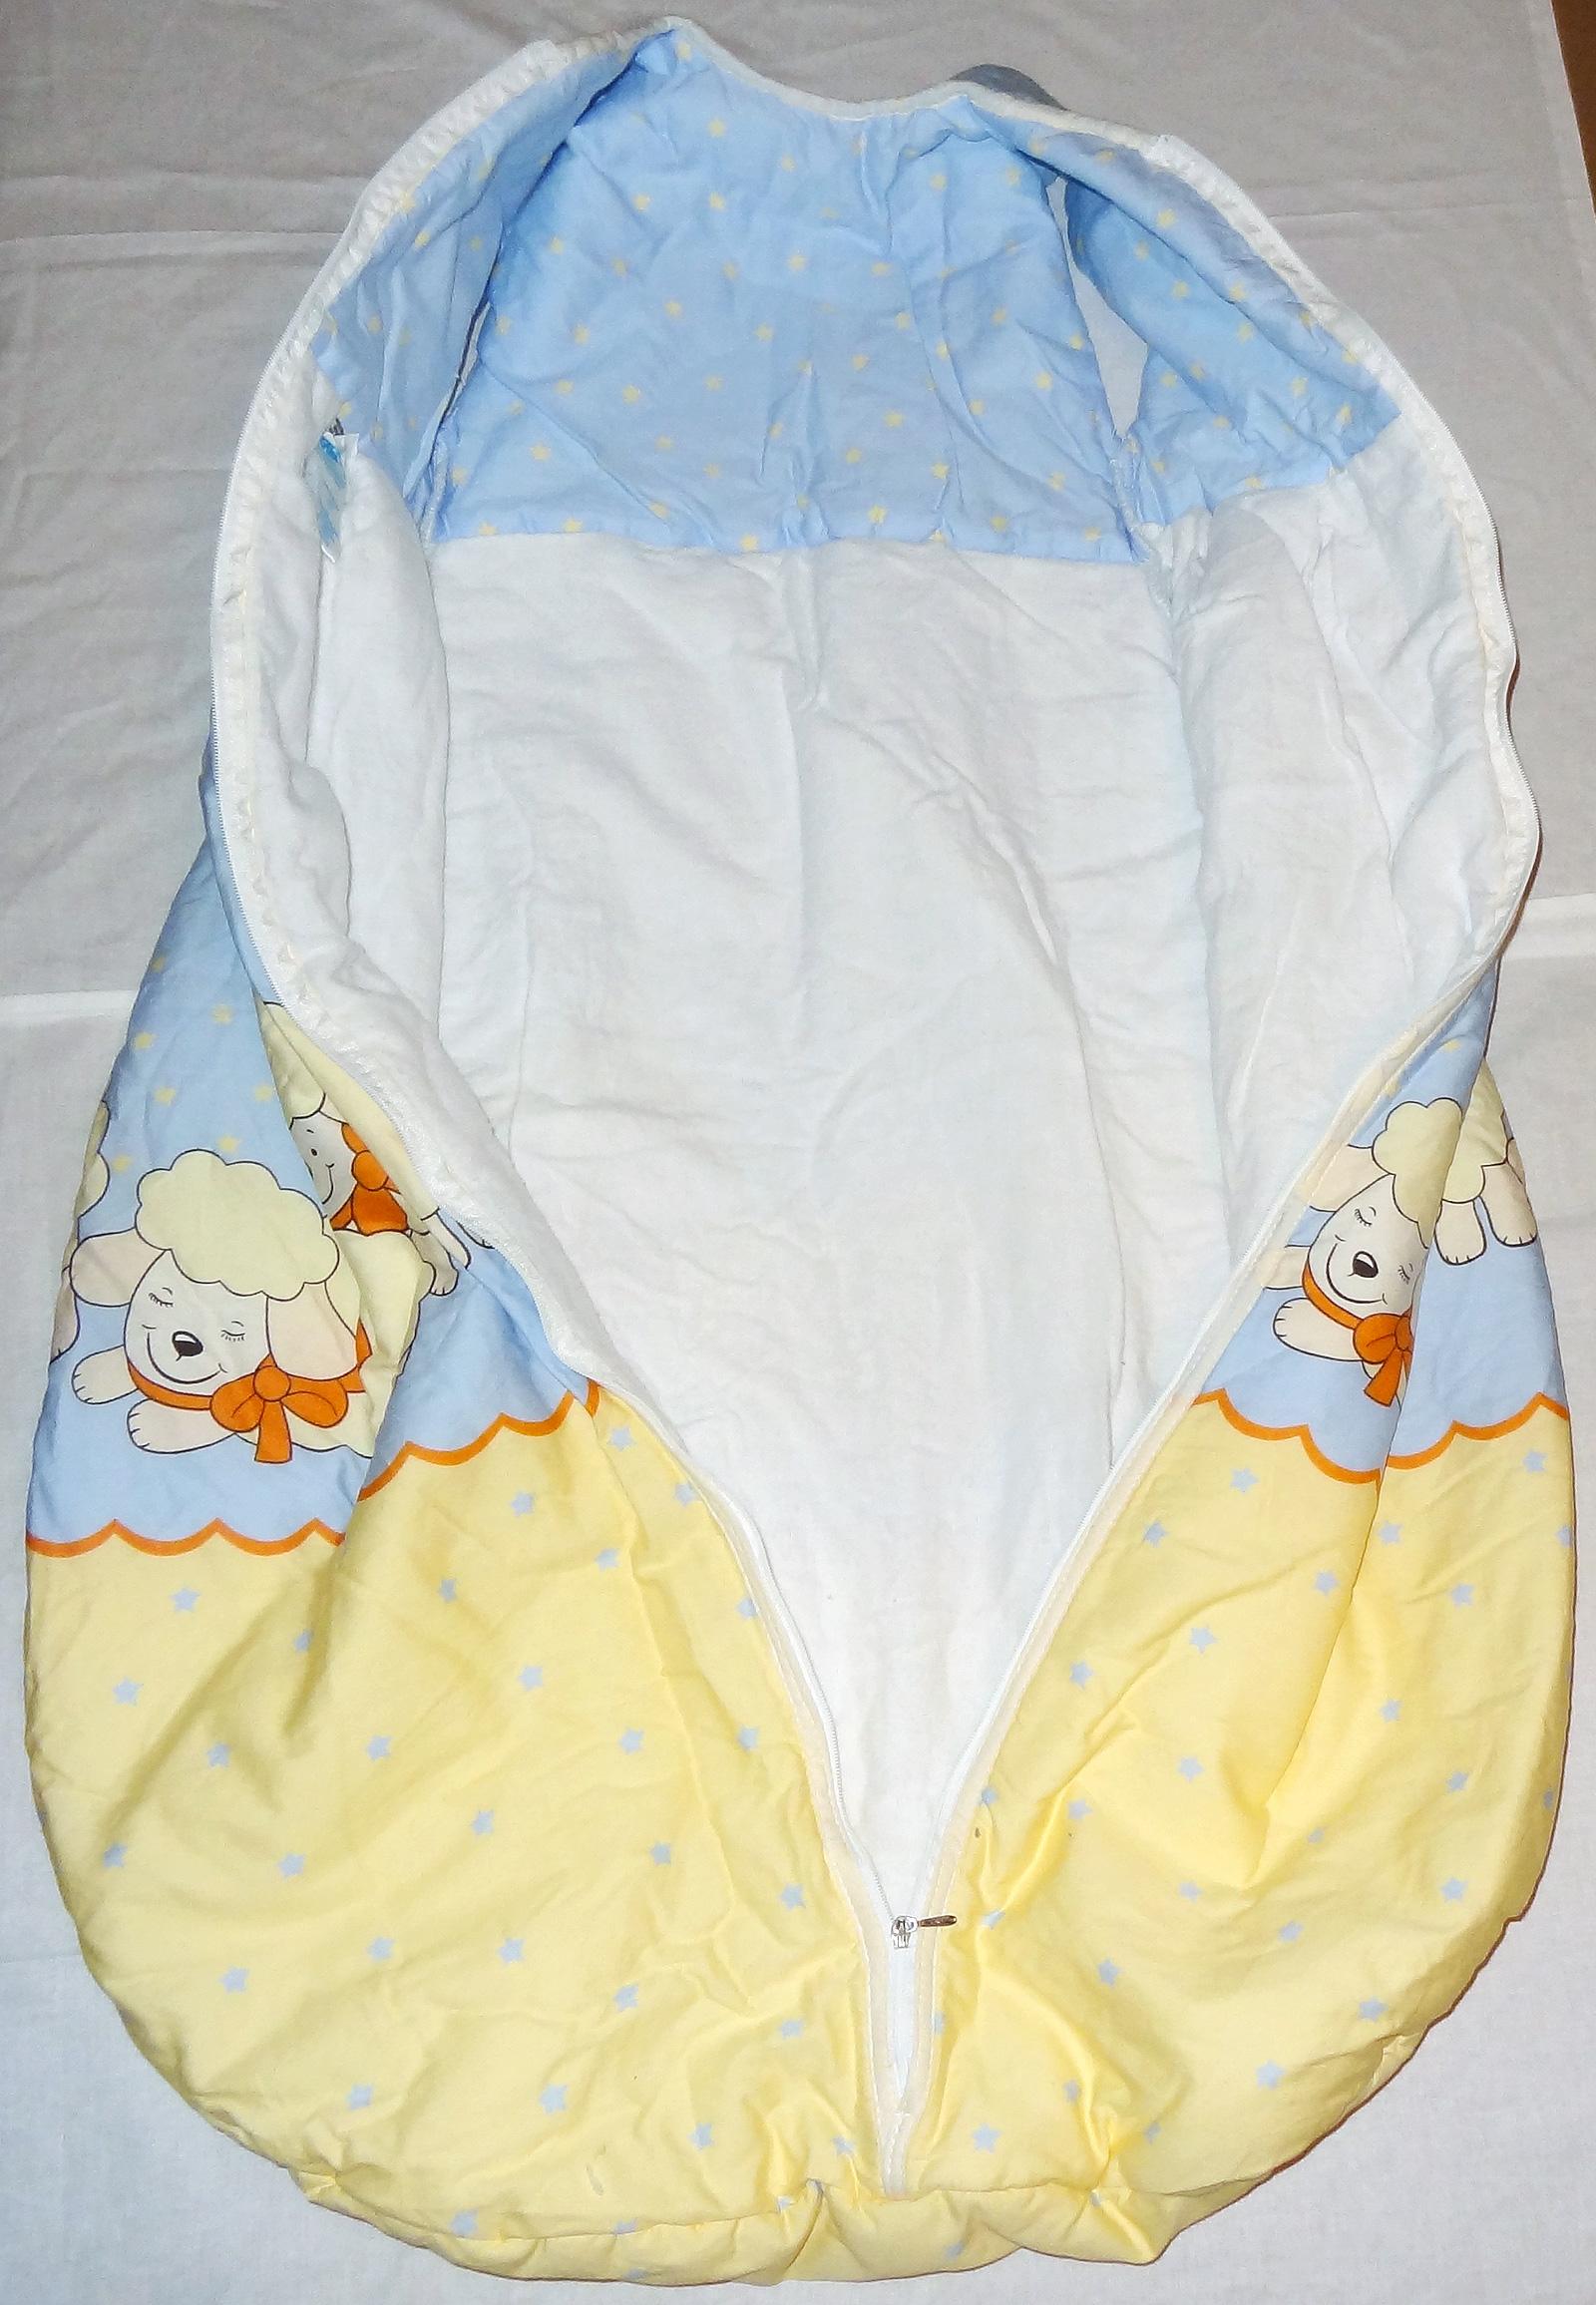 alvi baby schlafsack herbst kugel gr e 110 molton blau gelb mit motiv warm ebay. Black Bedroom Furniture Sets. Home Design Ideas